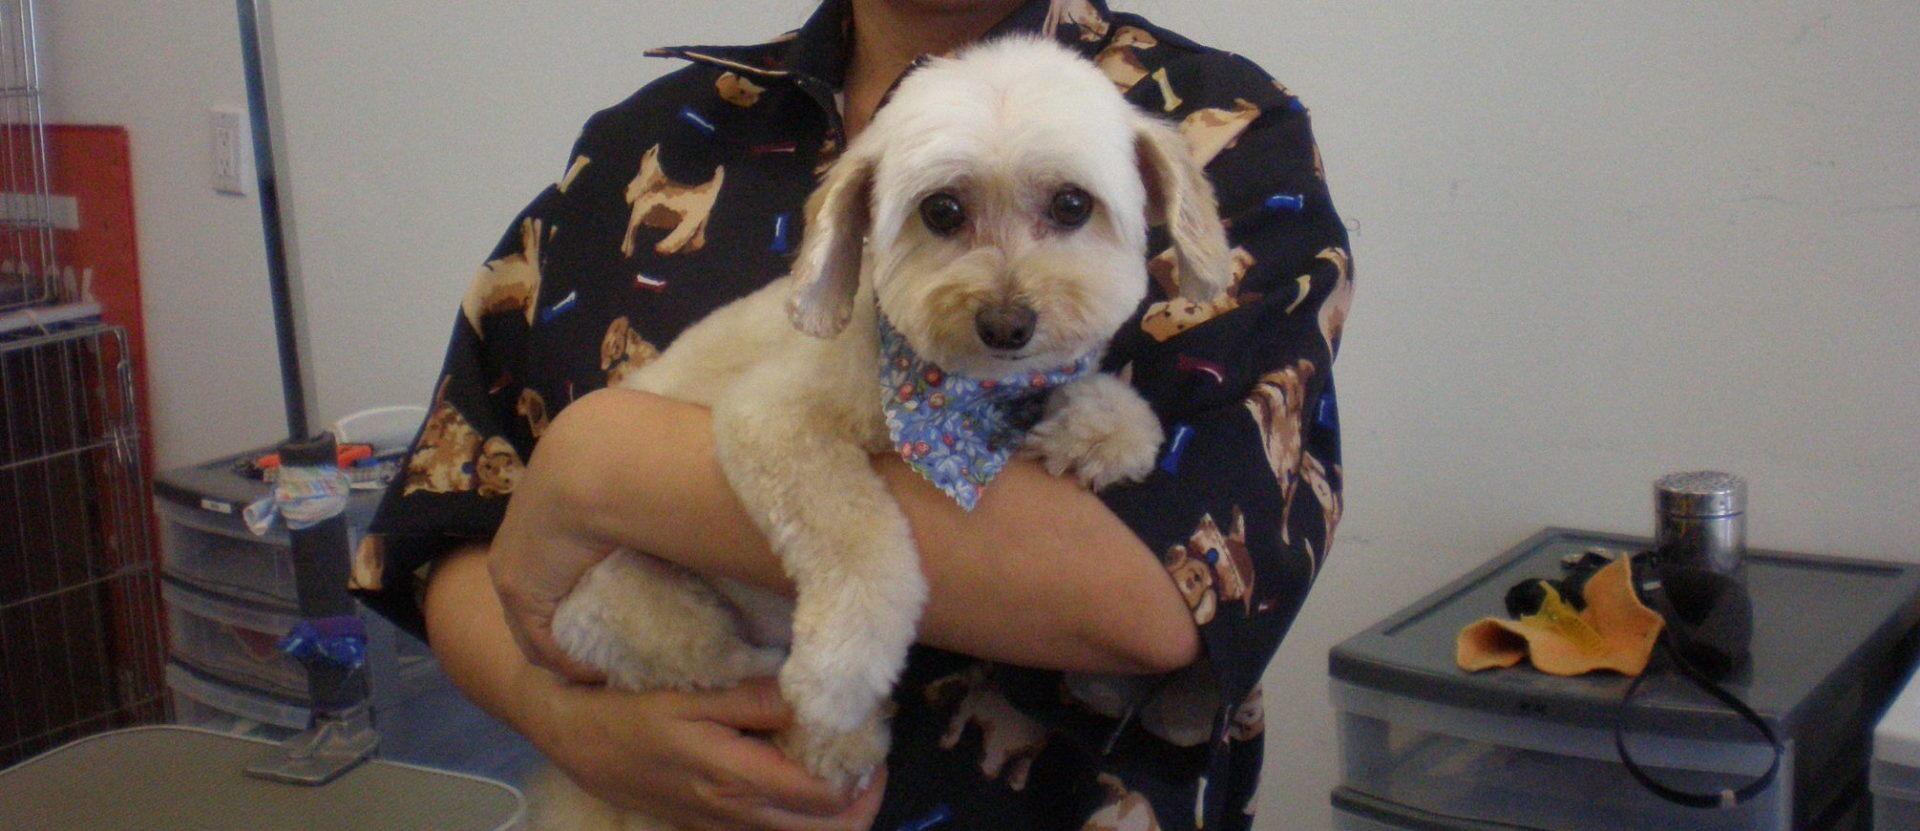 pet grooming studio, dog and groomer